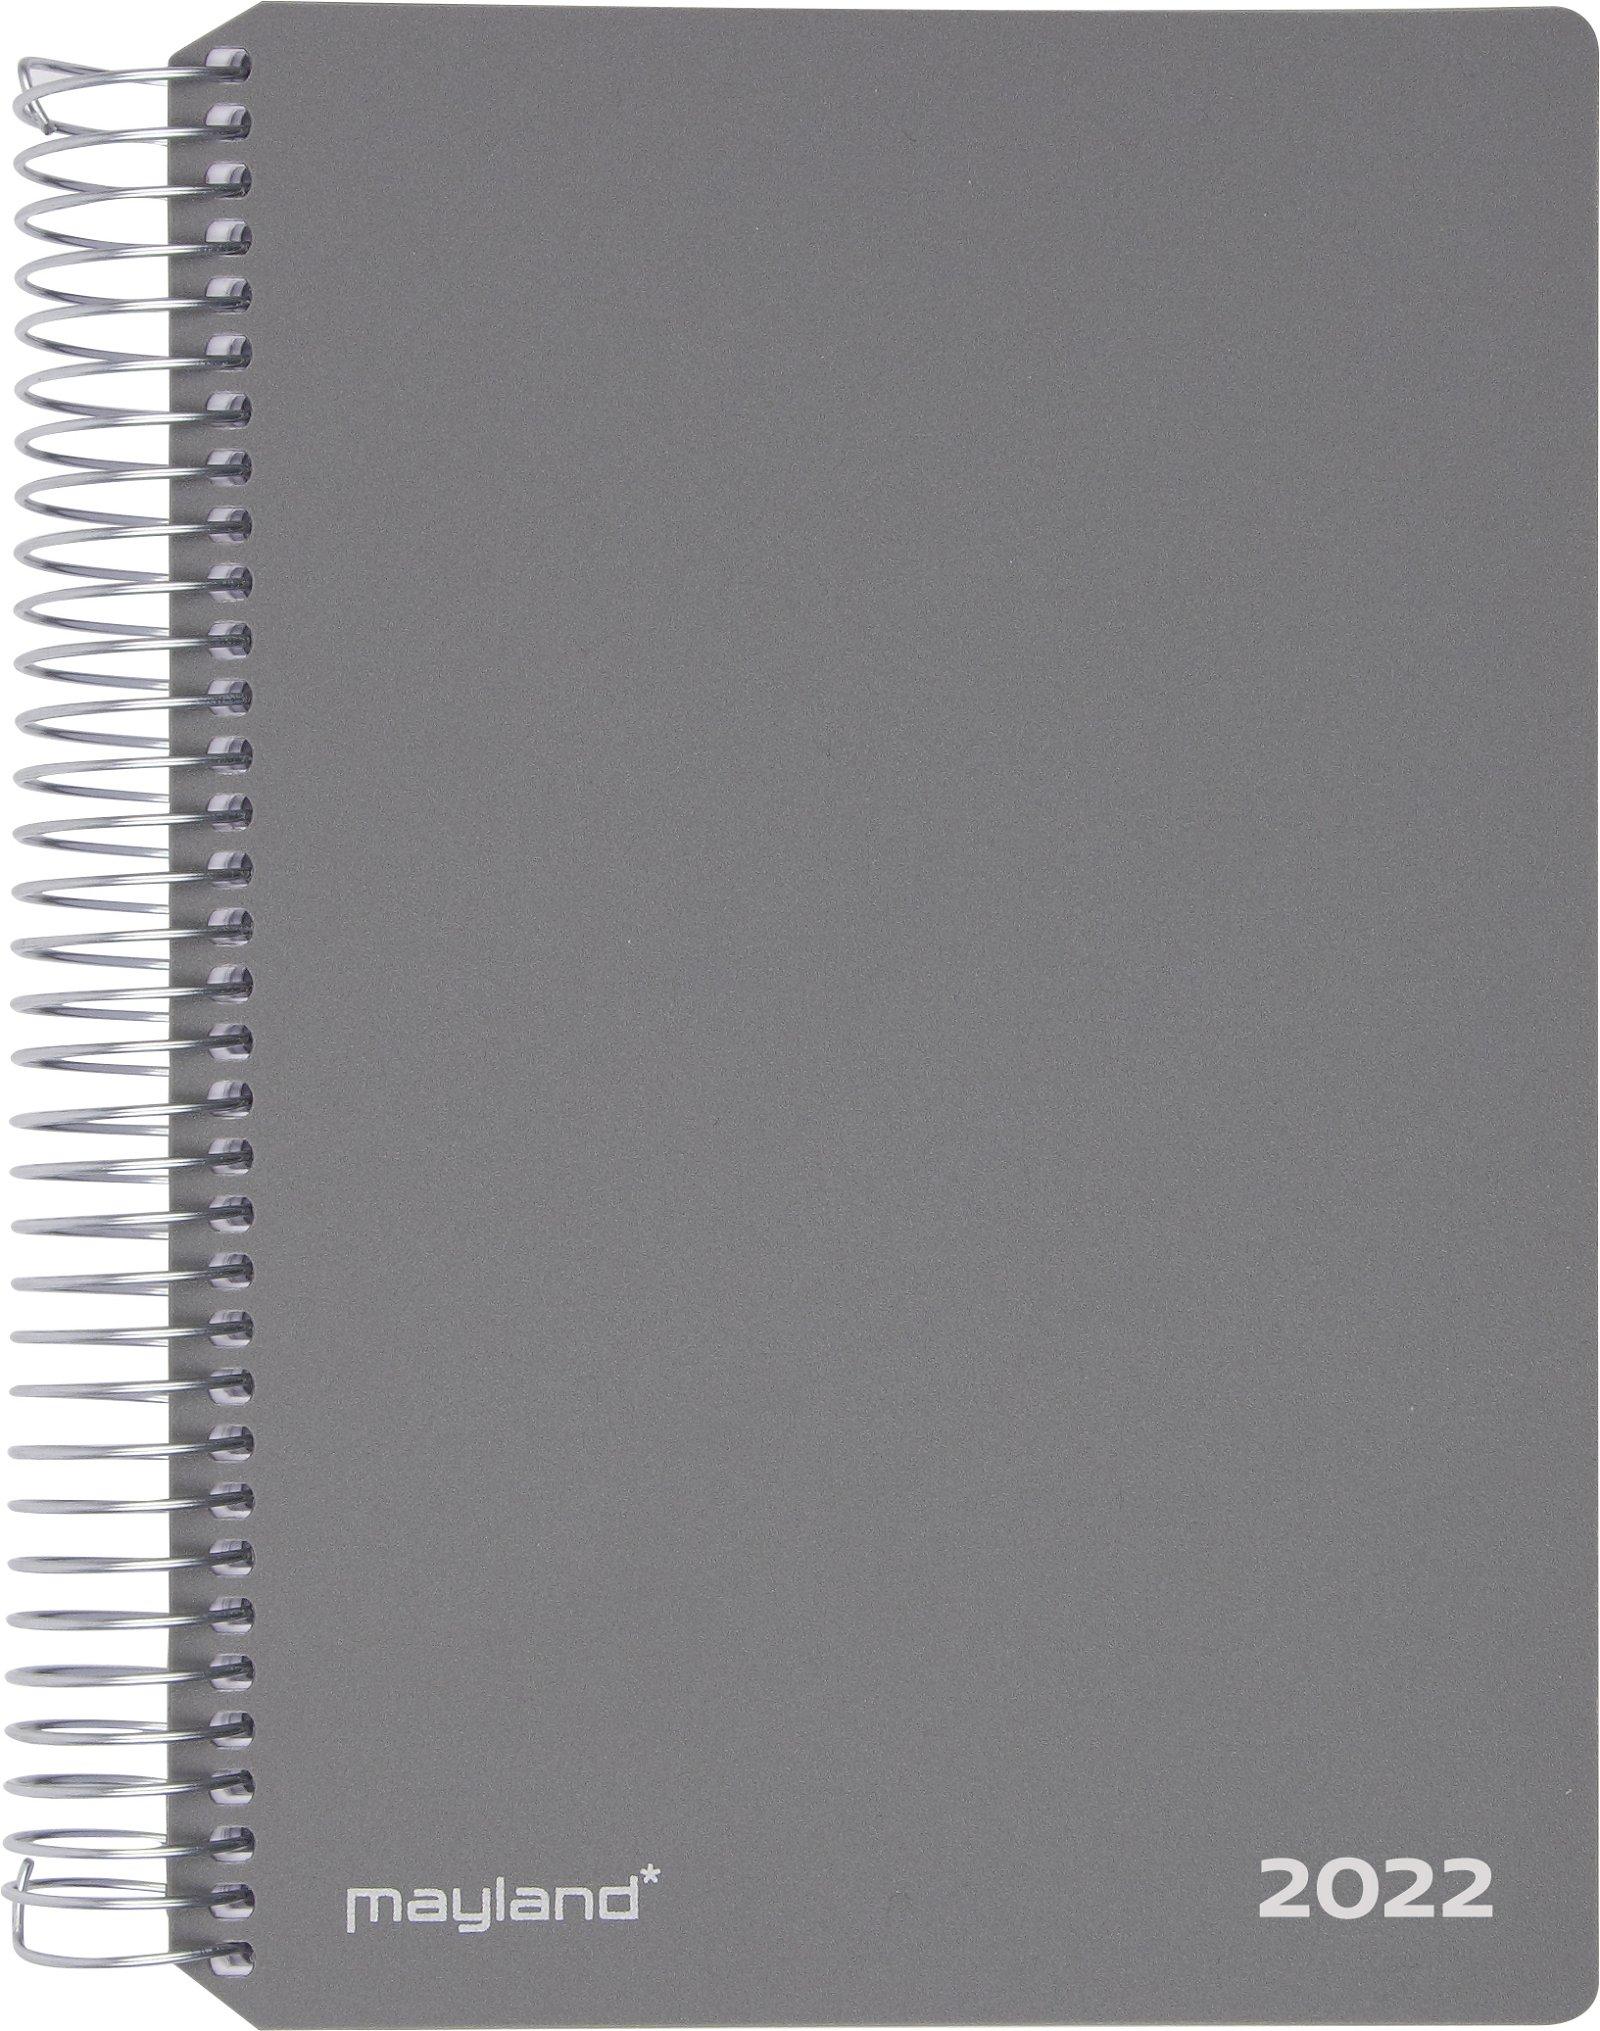 Mayland Spiralkalender 1-dag  2022